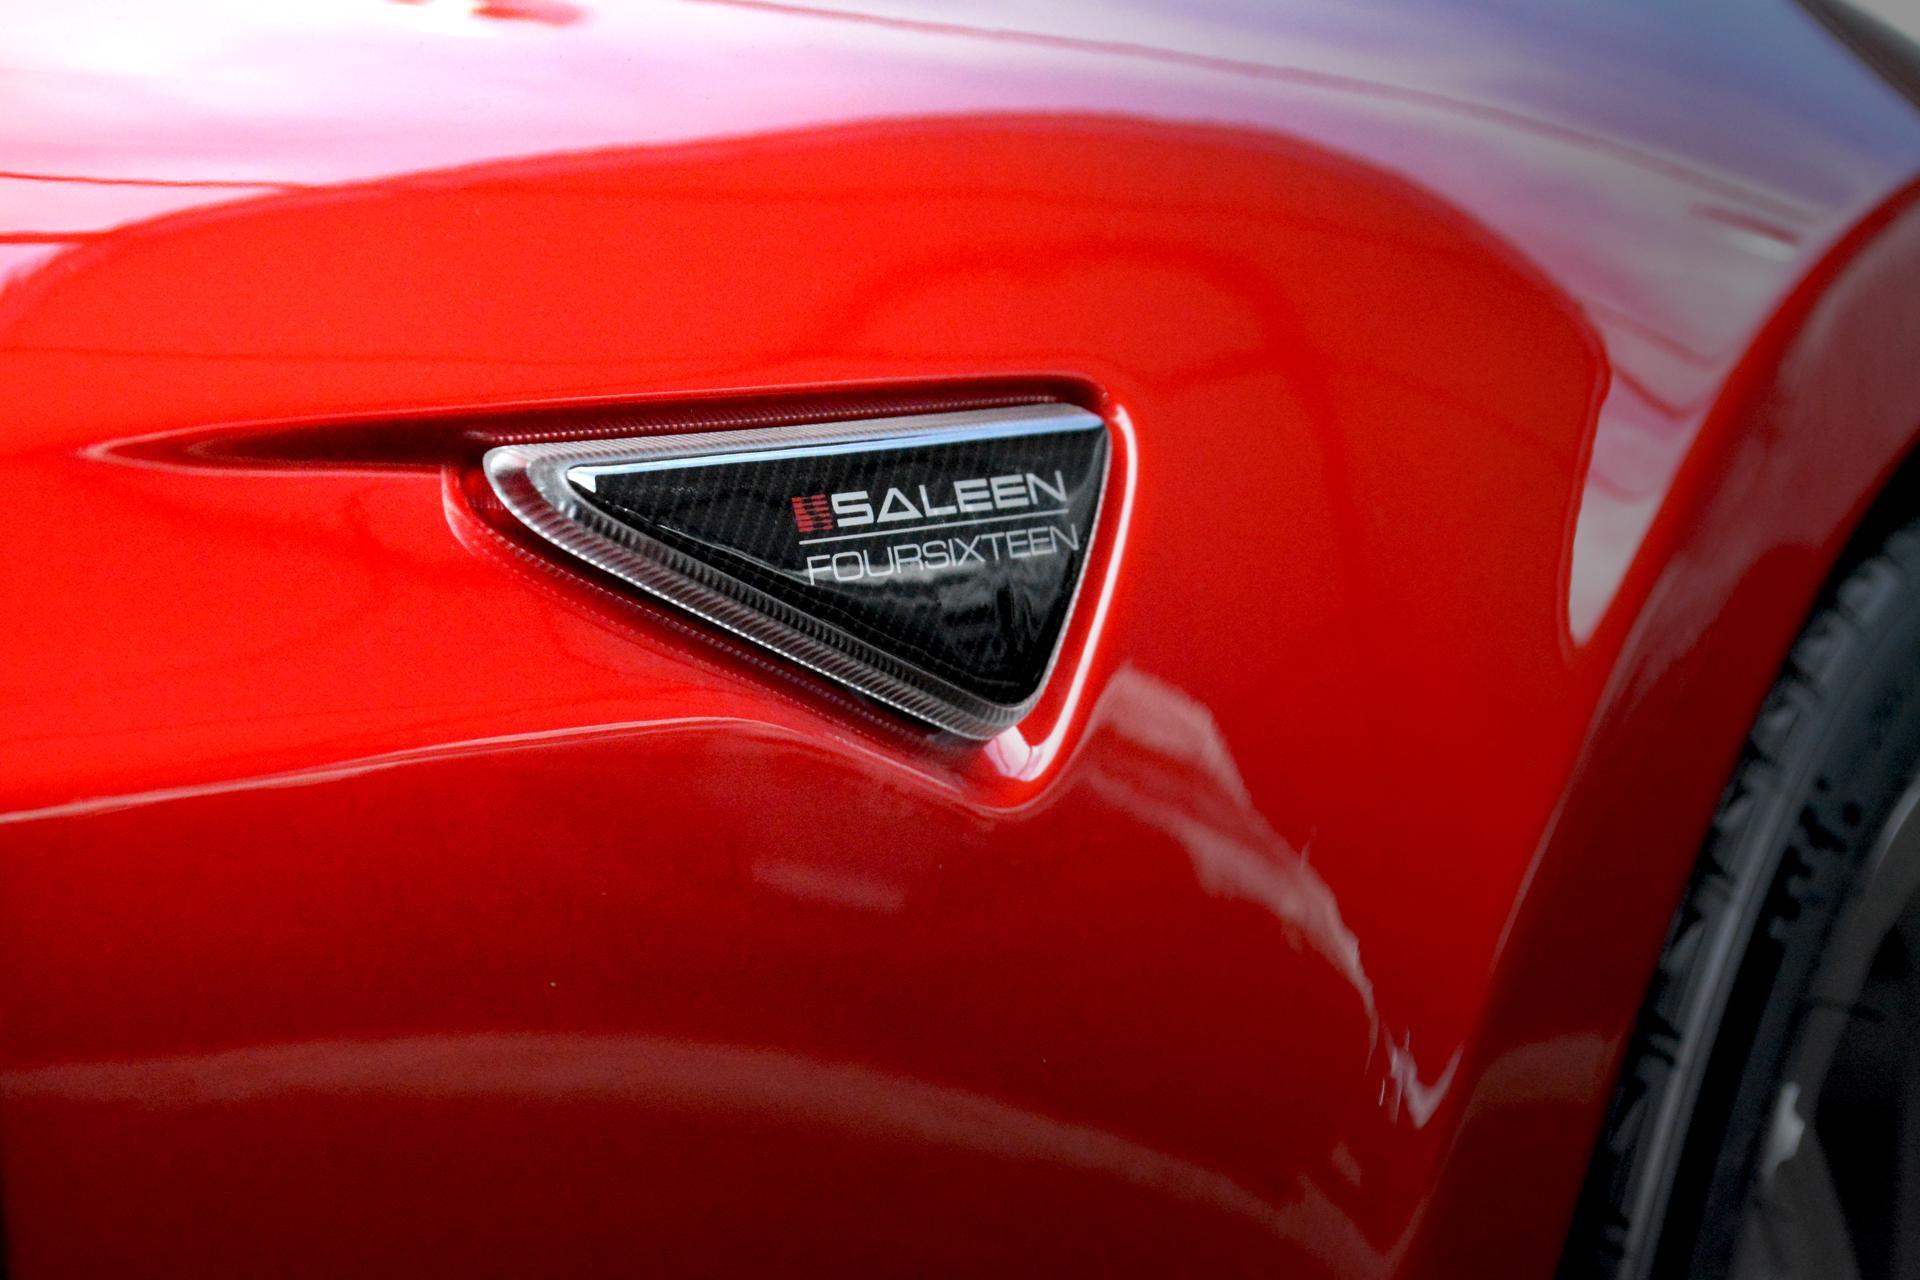 Saleen-Tesla Model S FOURSIXTEEN is an electric monster - SlashGear